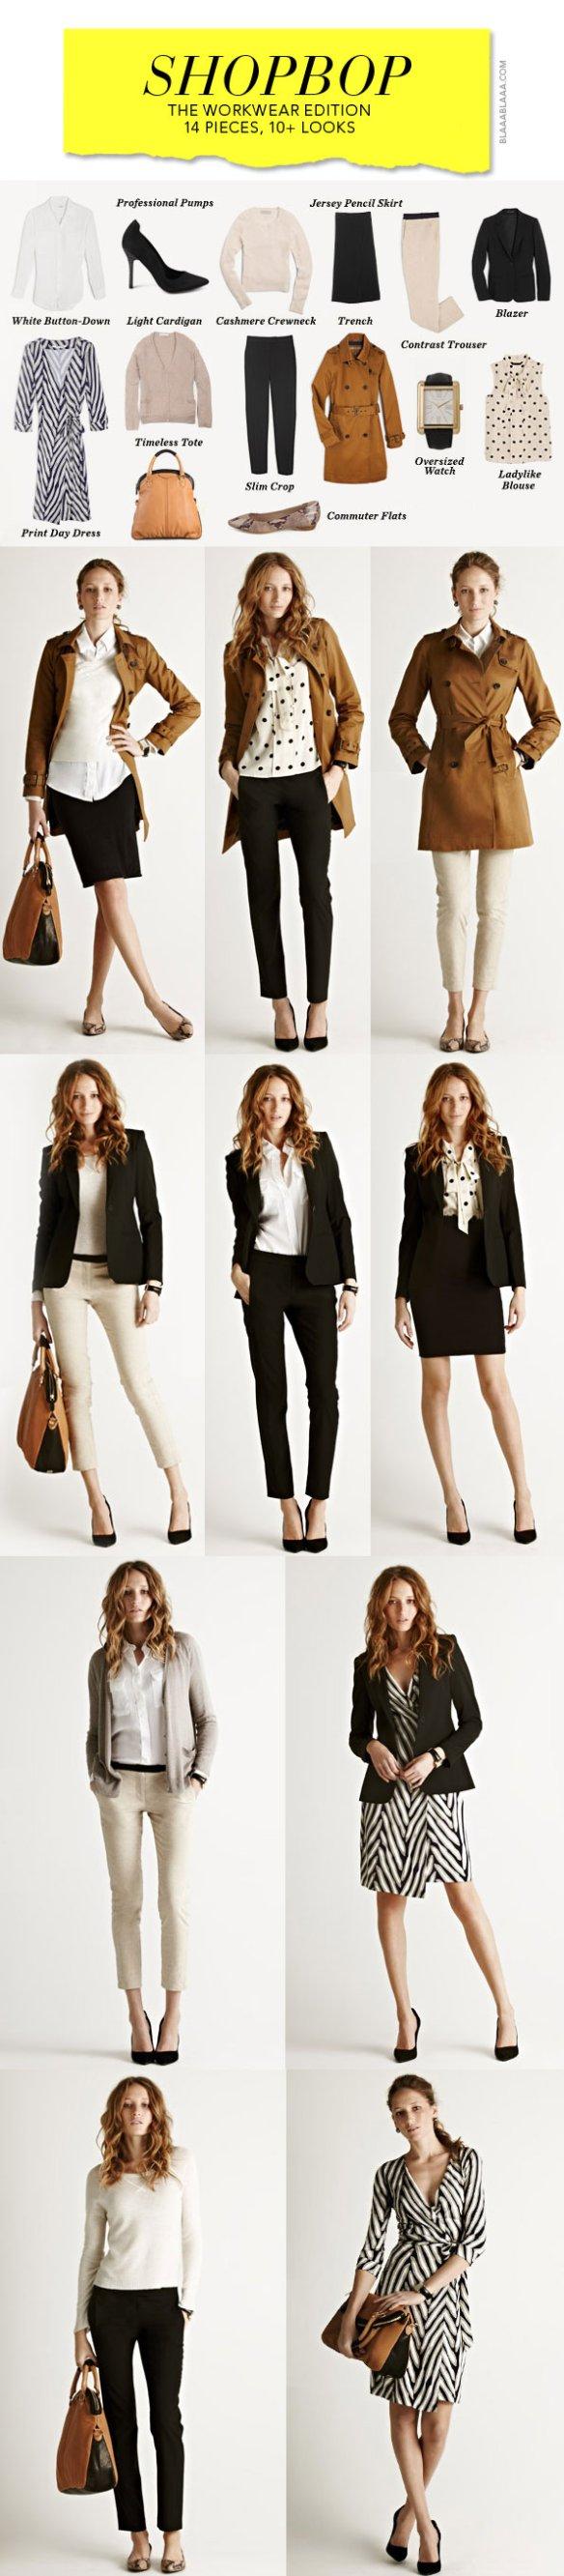 """the ultimate wardrobe, workwear edition"" via shopbop.com"